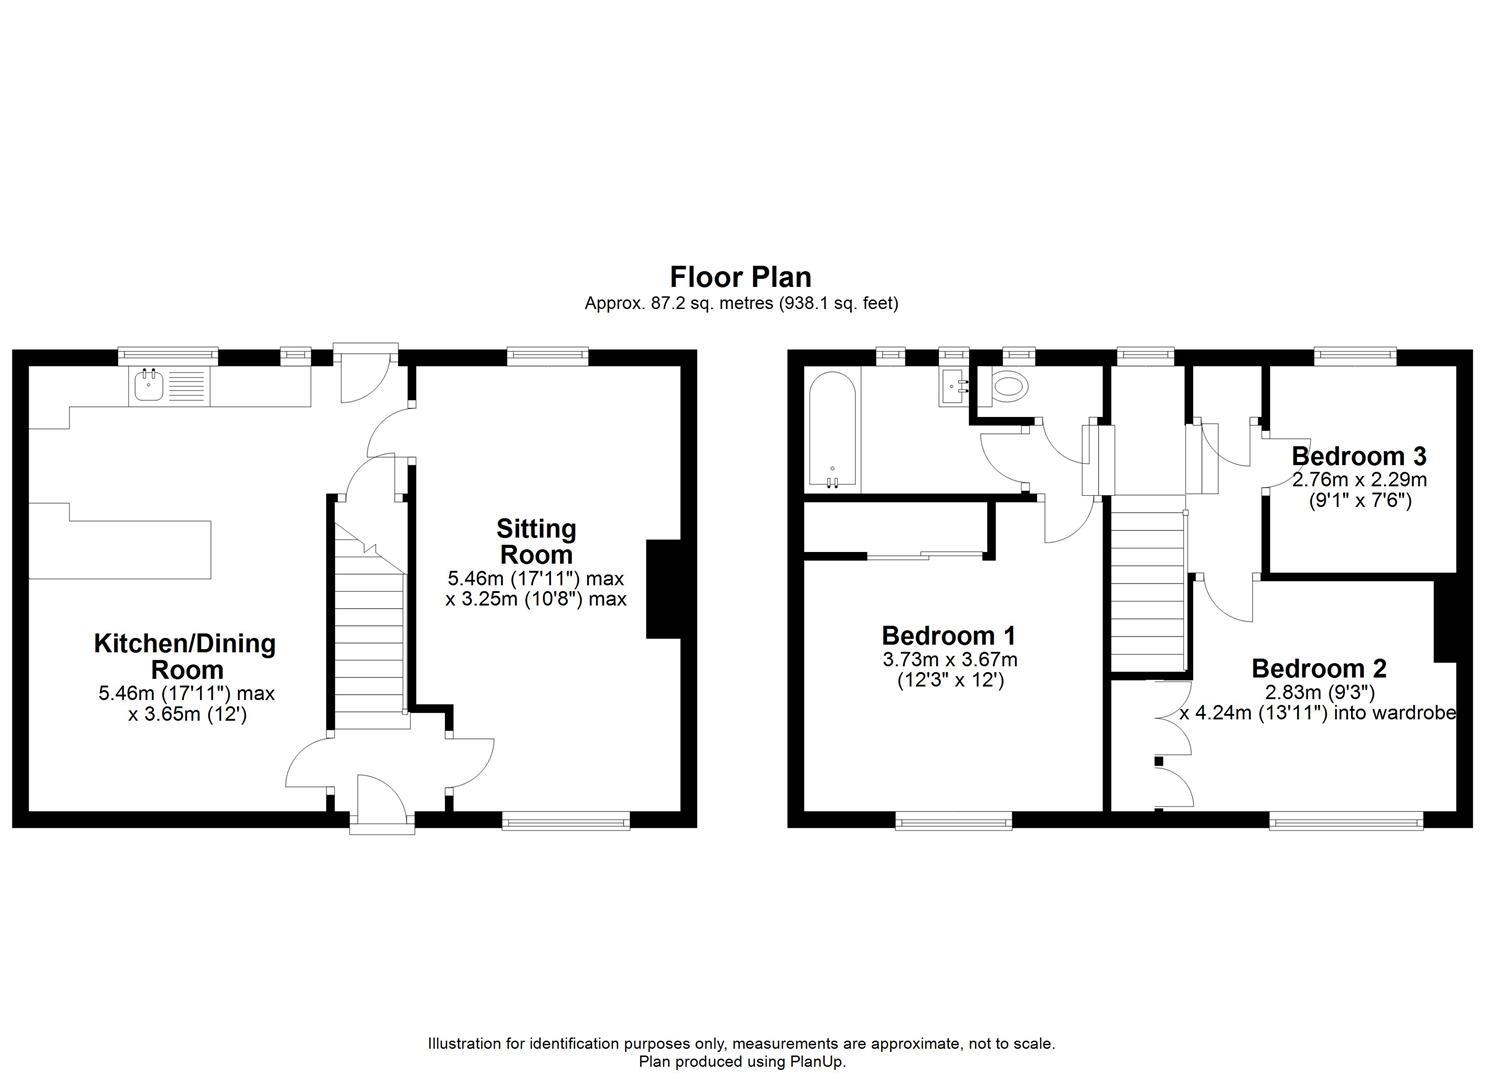 12 North End, Calne - Floorplan.JPG